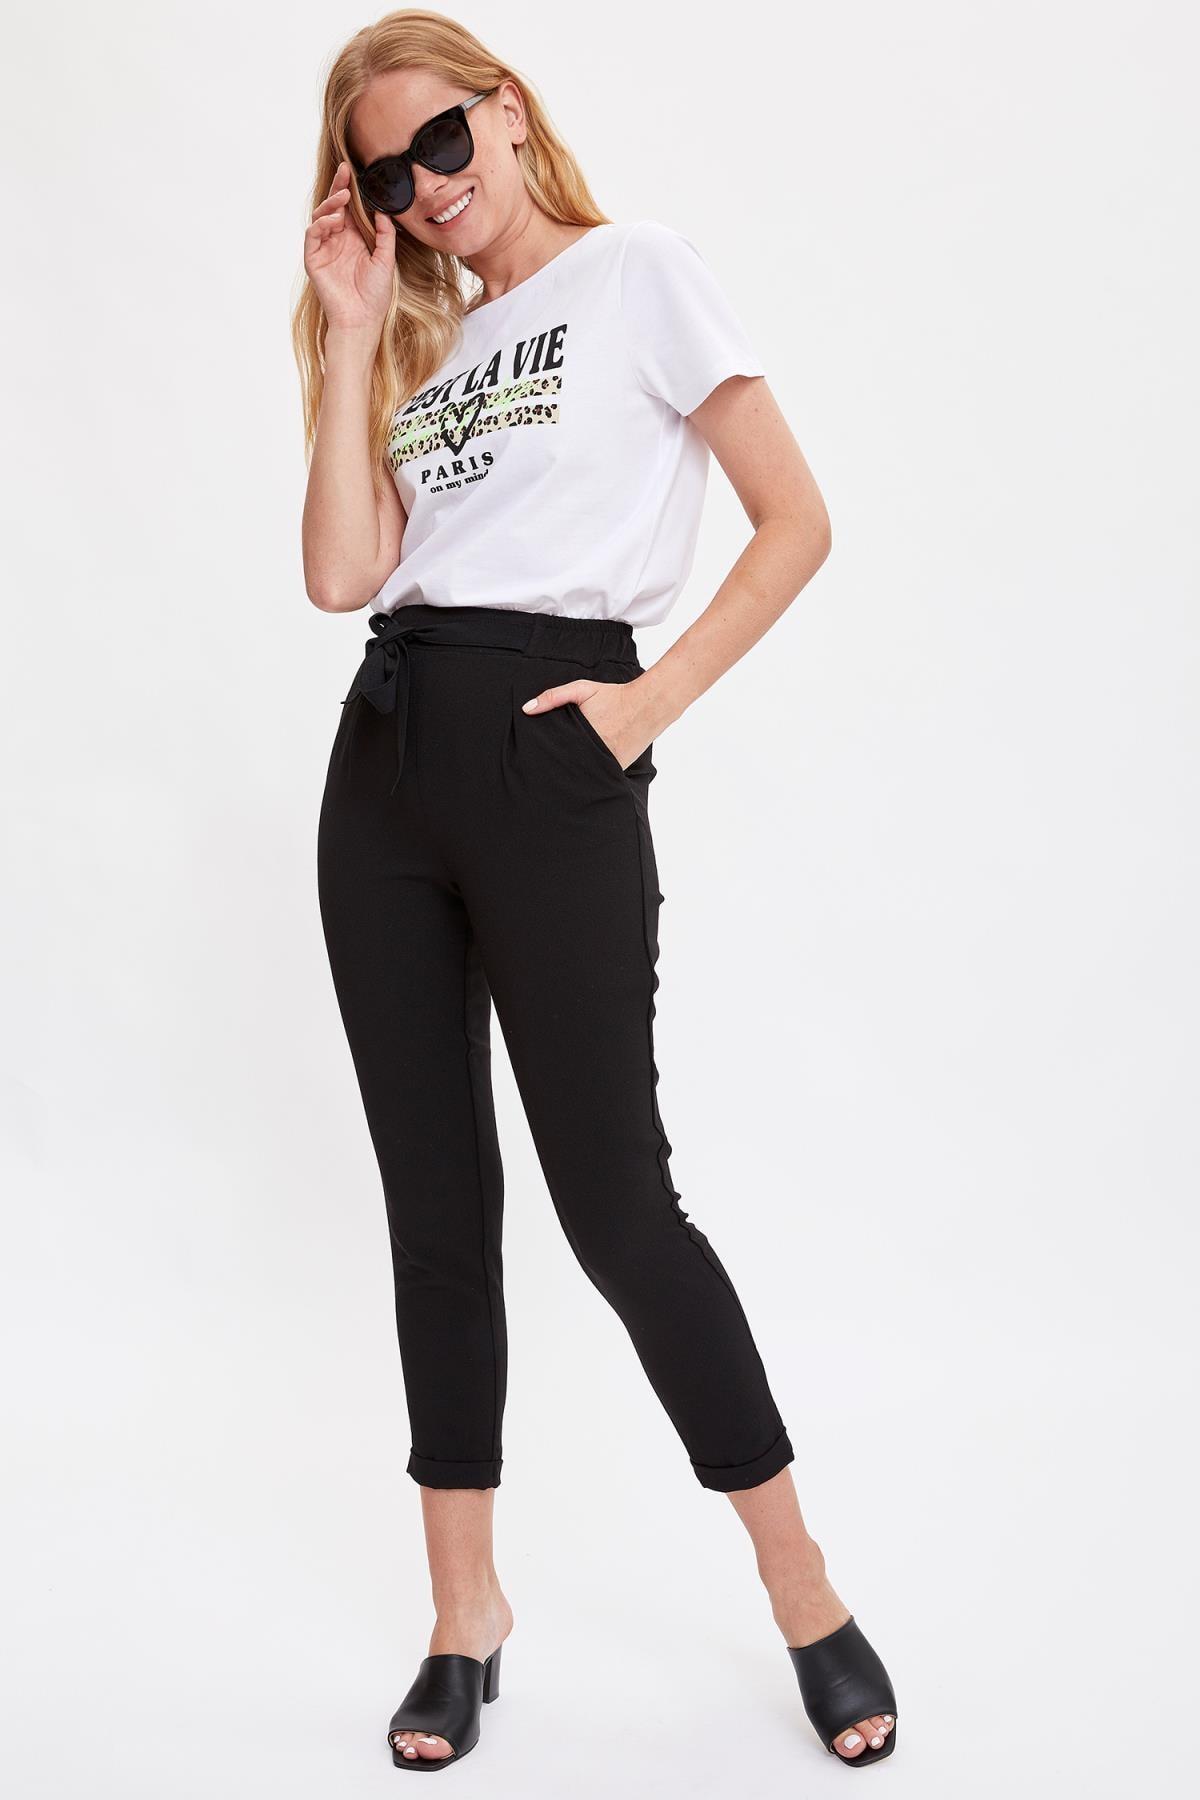 Defacto Kadın Beyaz Baskılı Kısa Kollu T-shirt L7702AZ.19HS.WT34 1